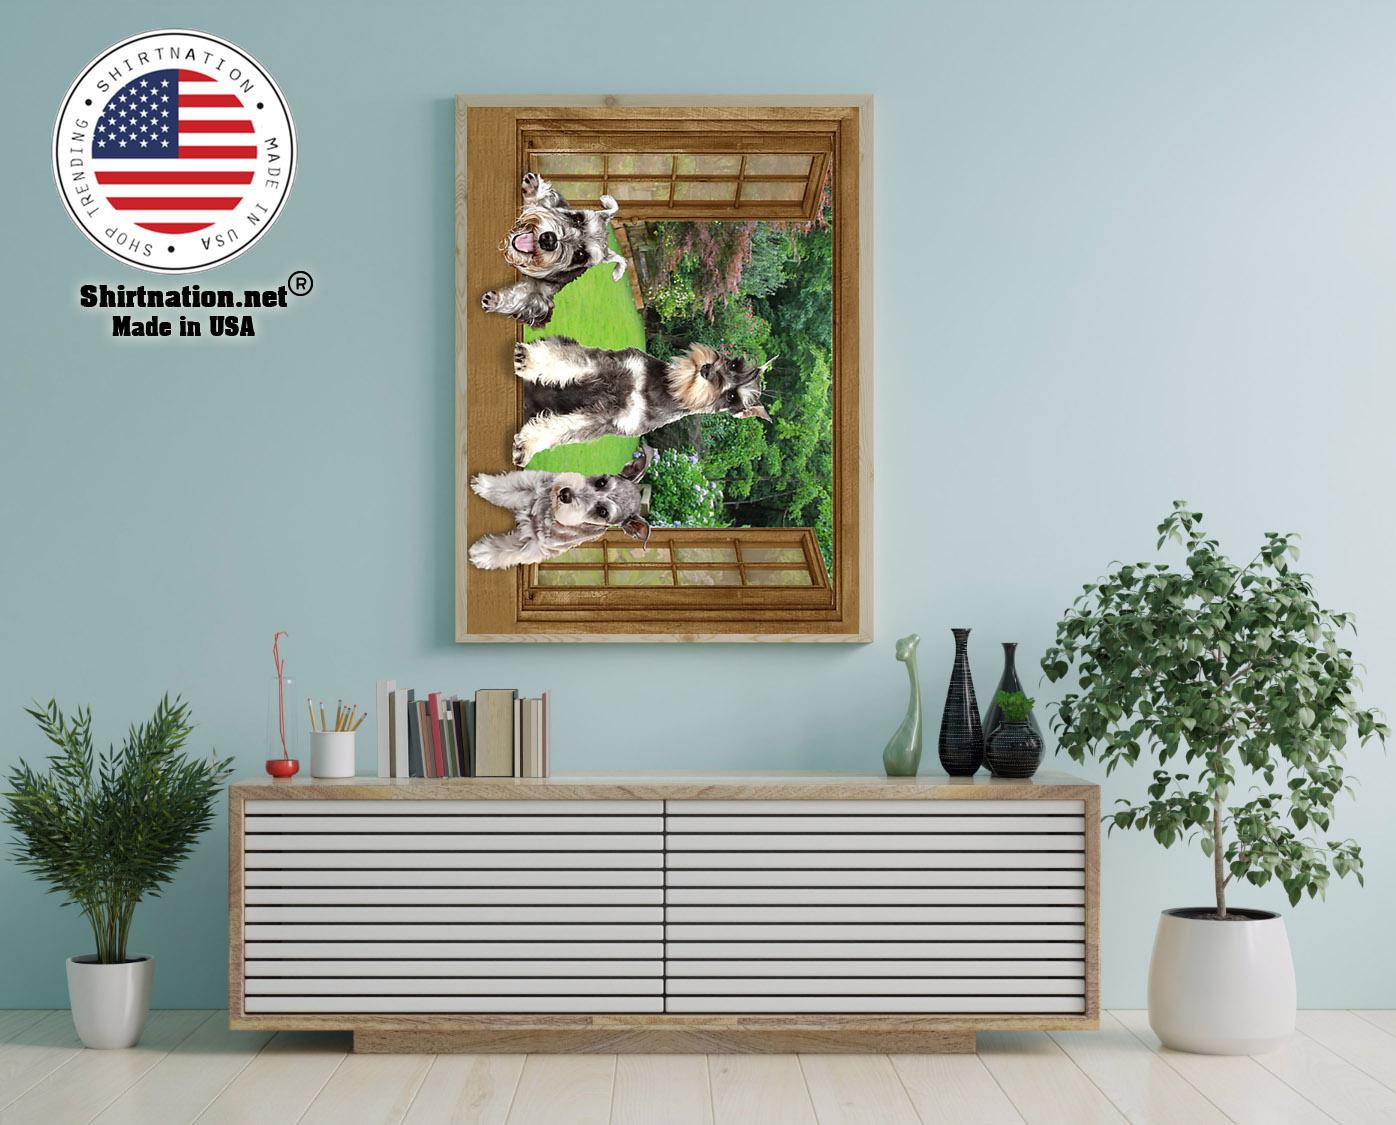 Schnauzer dog view window poster 12